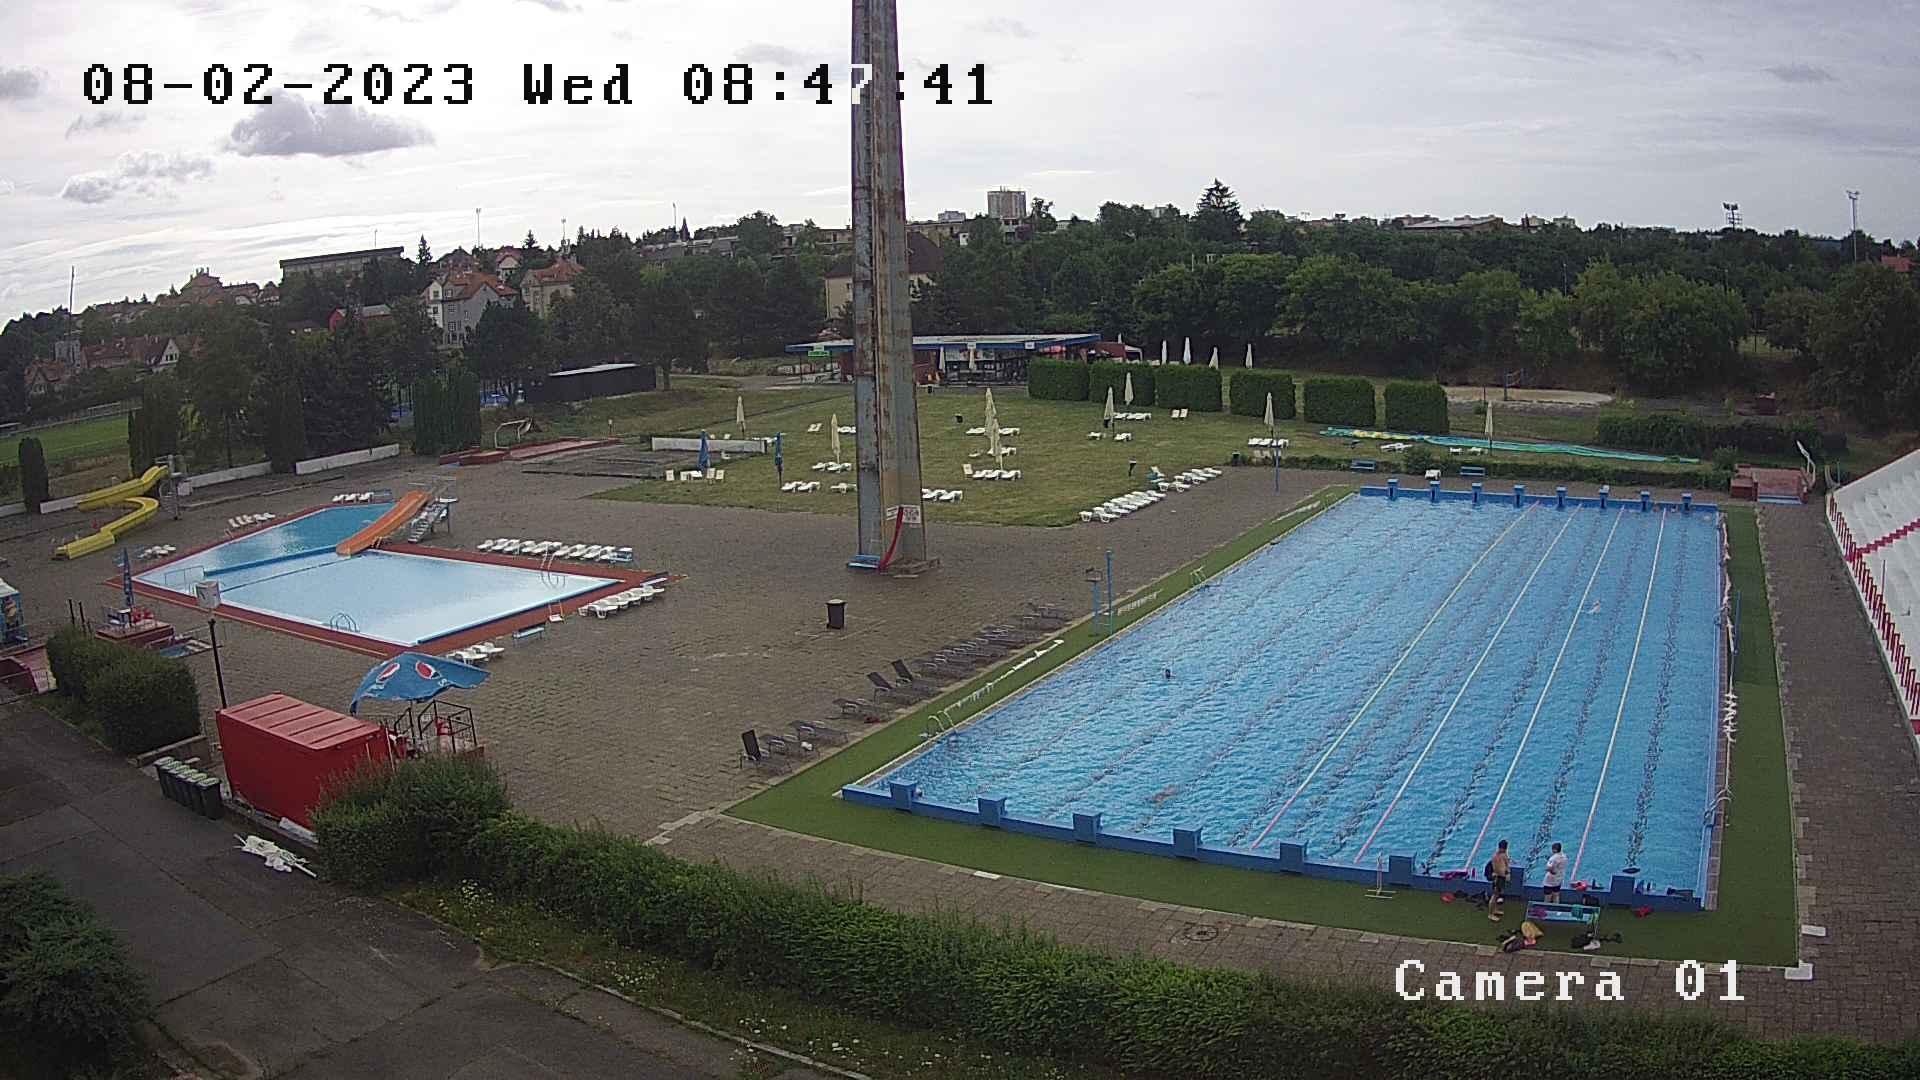 Plavecký stadion Slavie